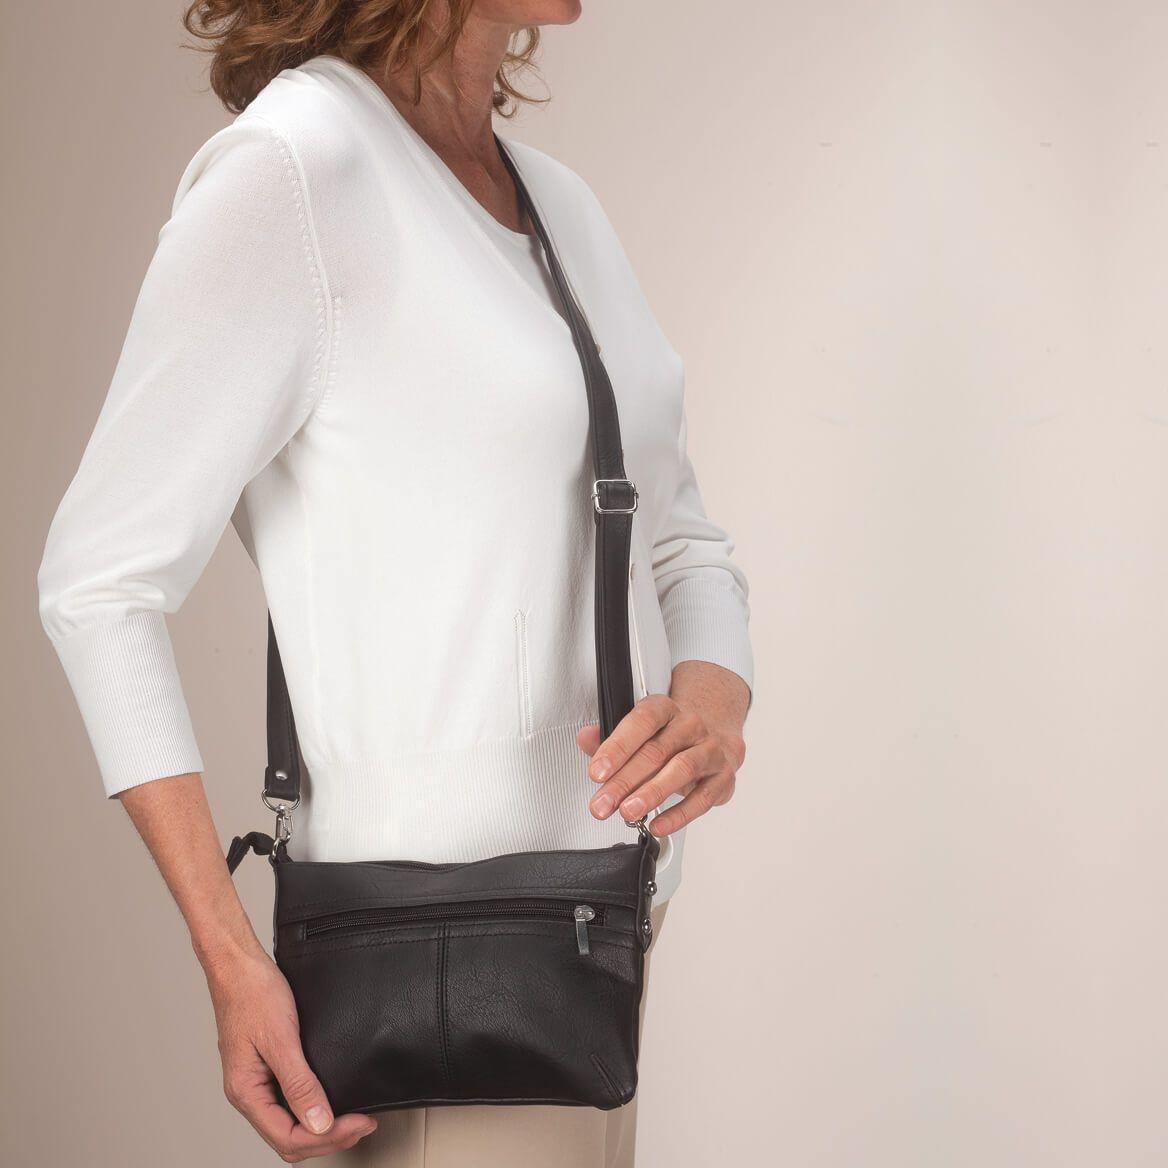 Small Everyday Crossbody Bag-352922